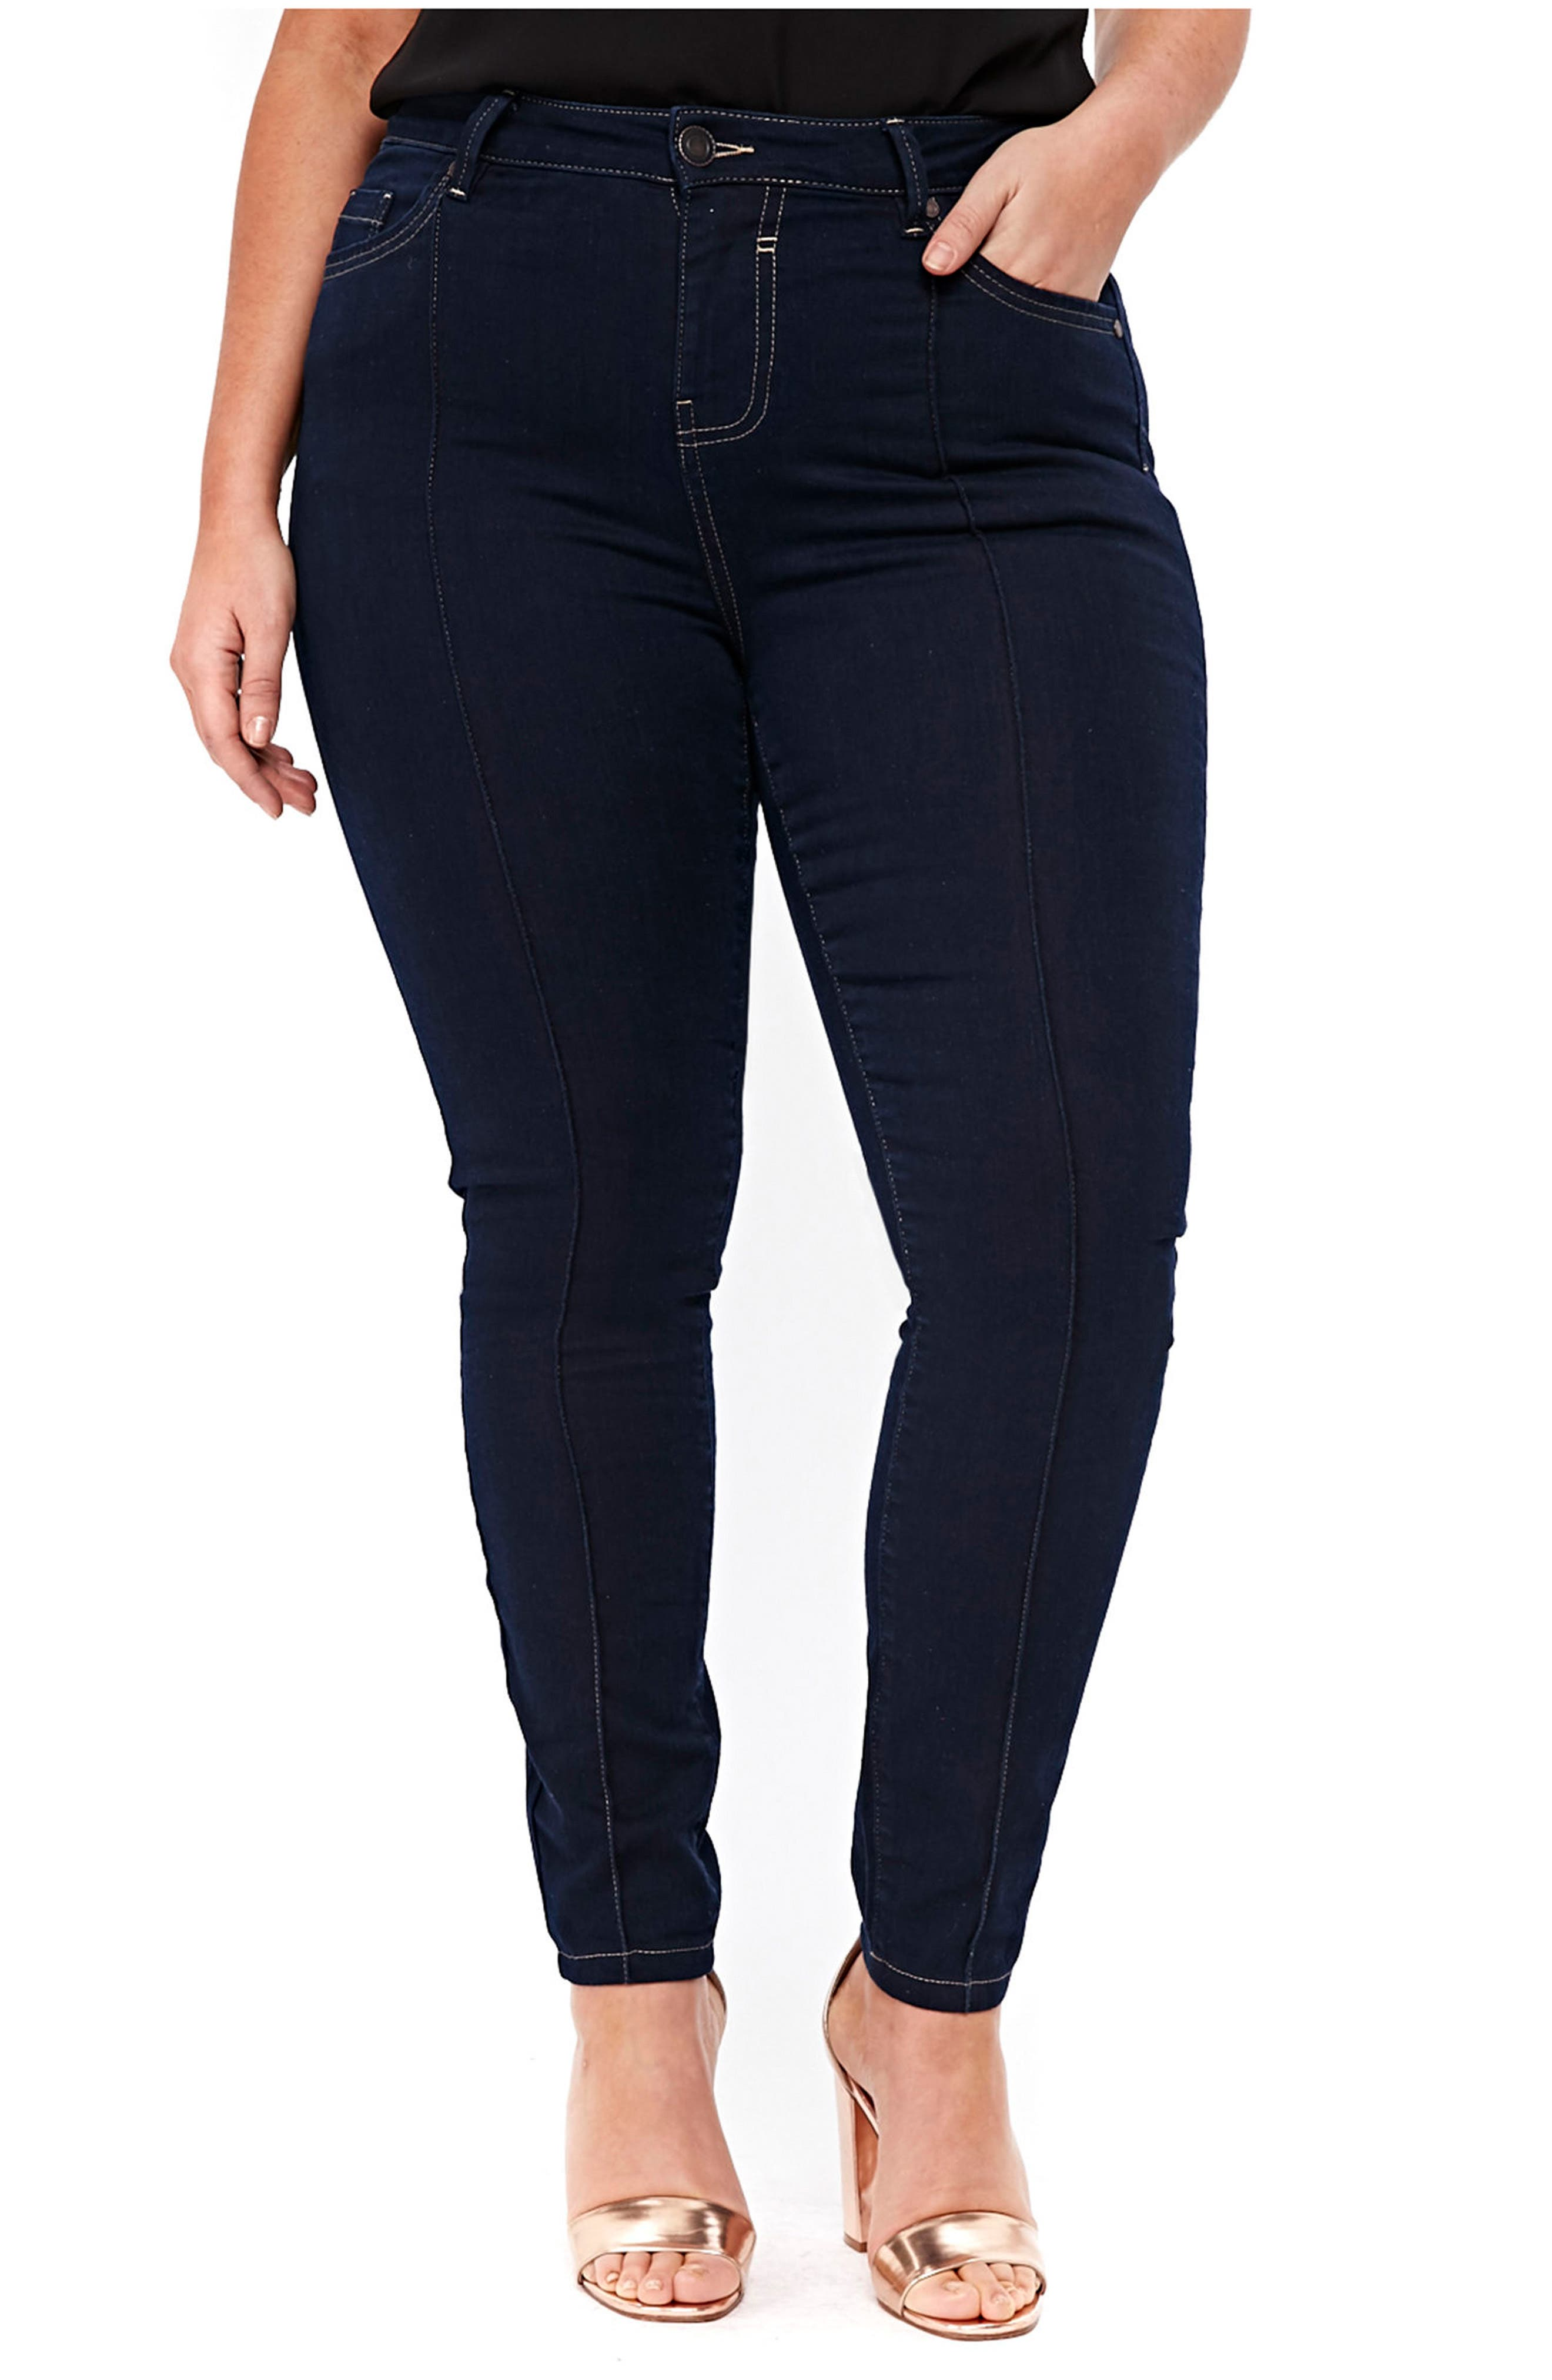 Pintuck High Waist Skinny Jeans,                         Main,                         color, Indigo